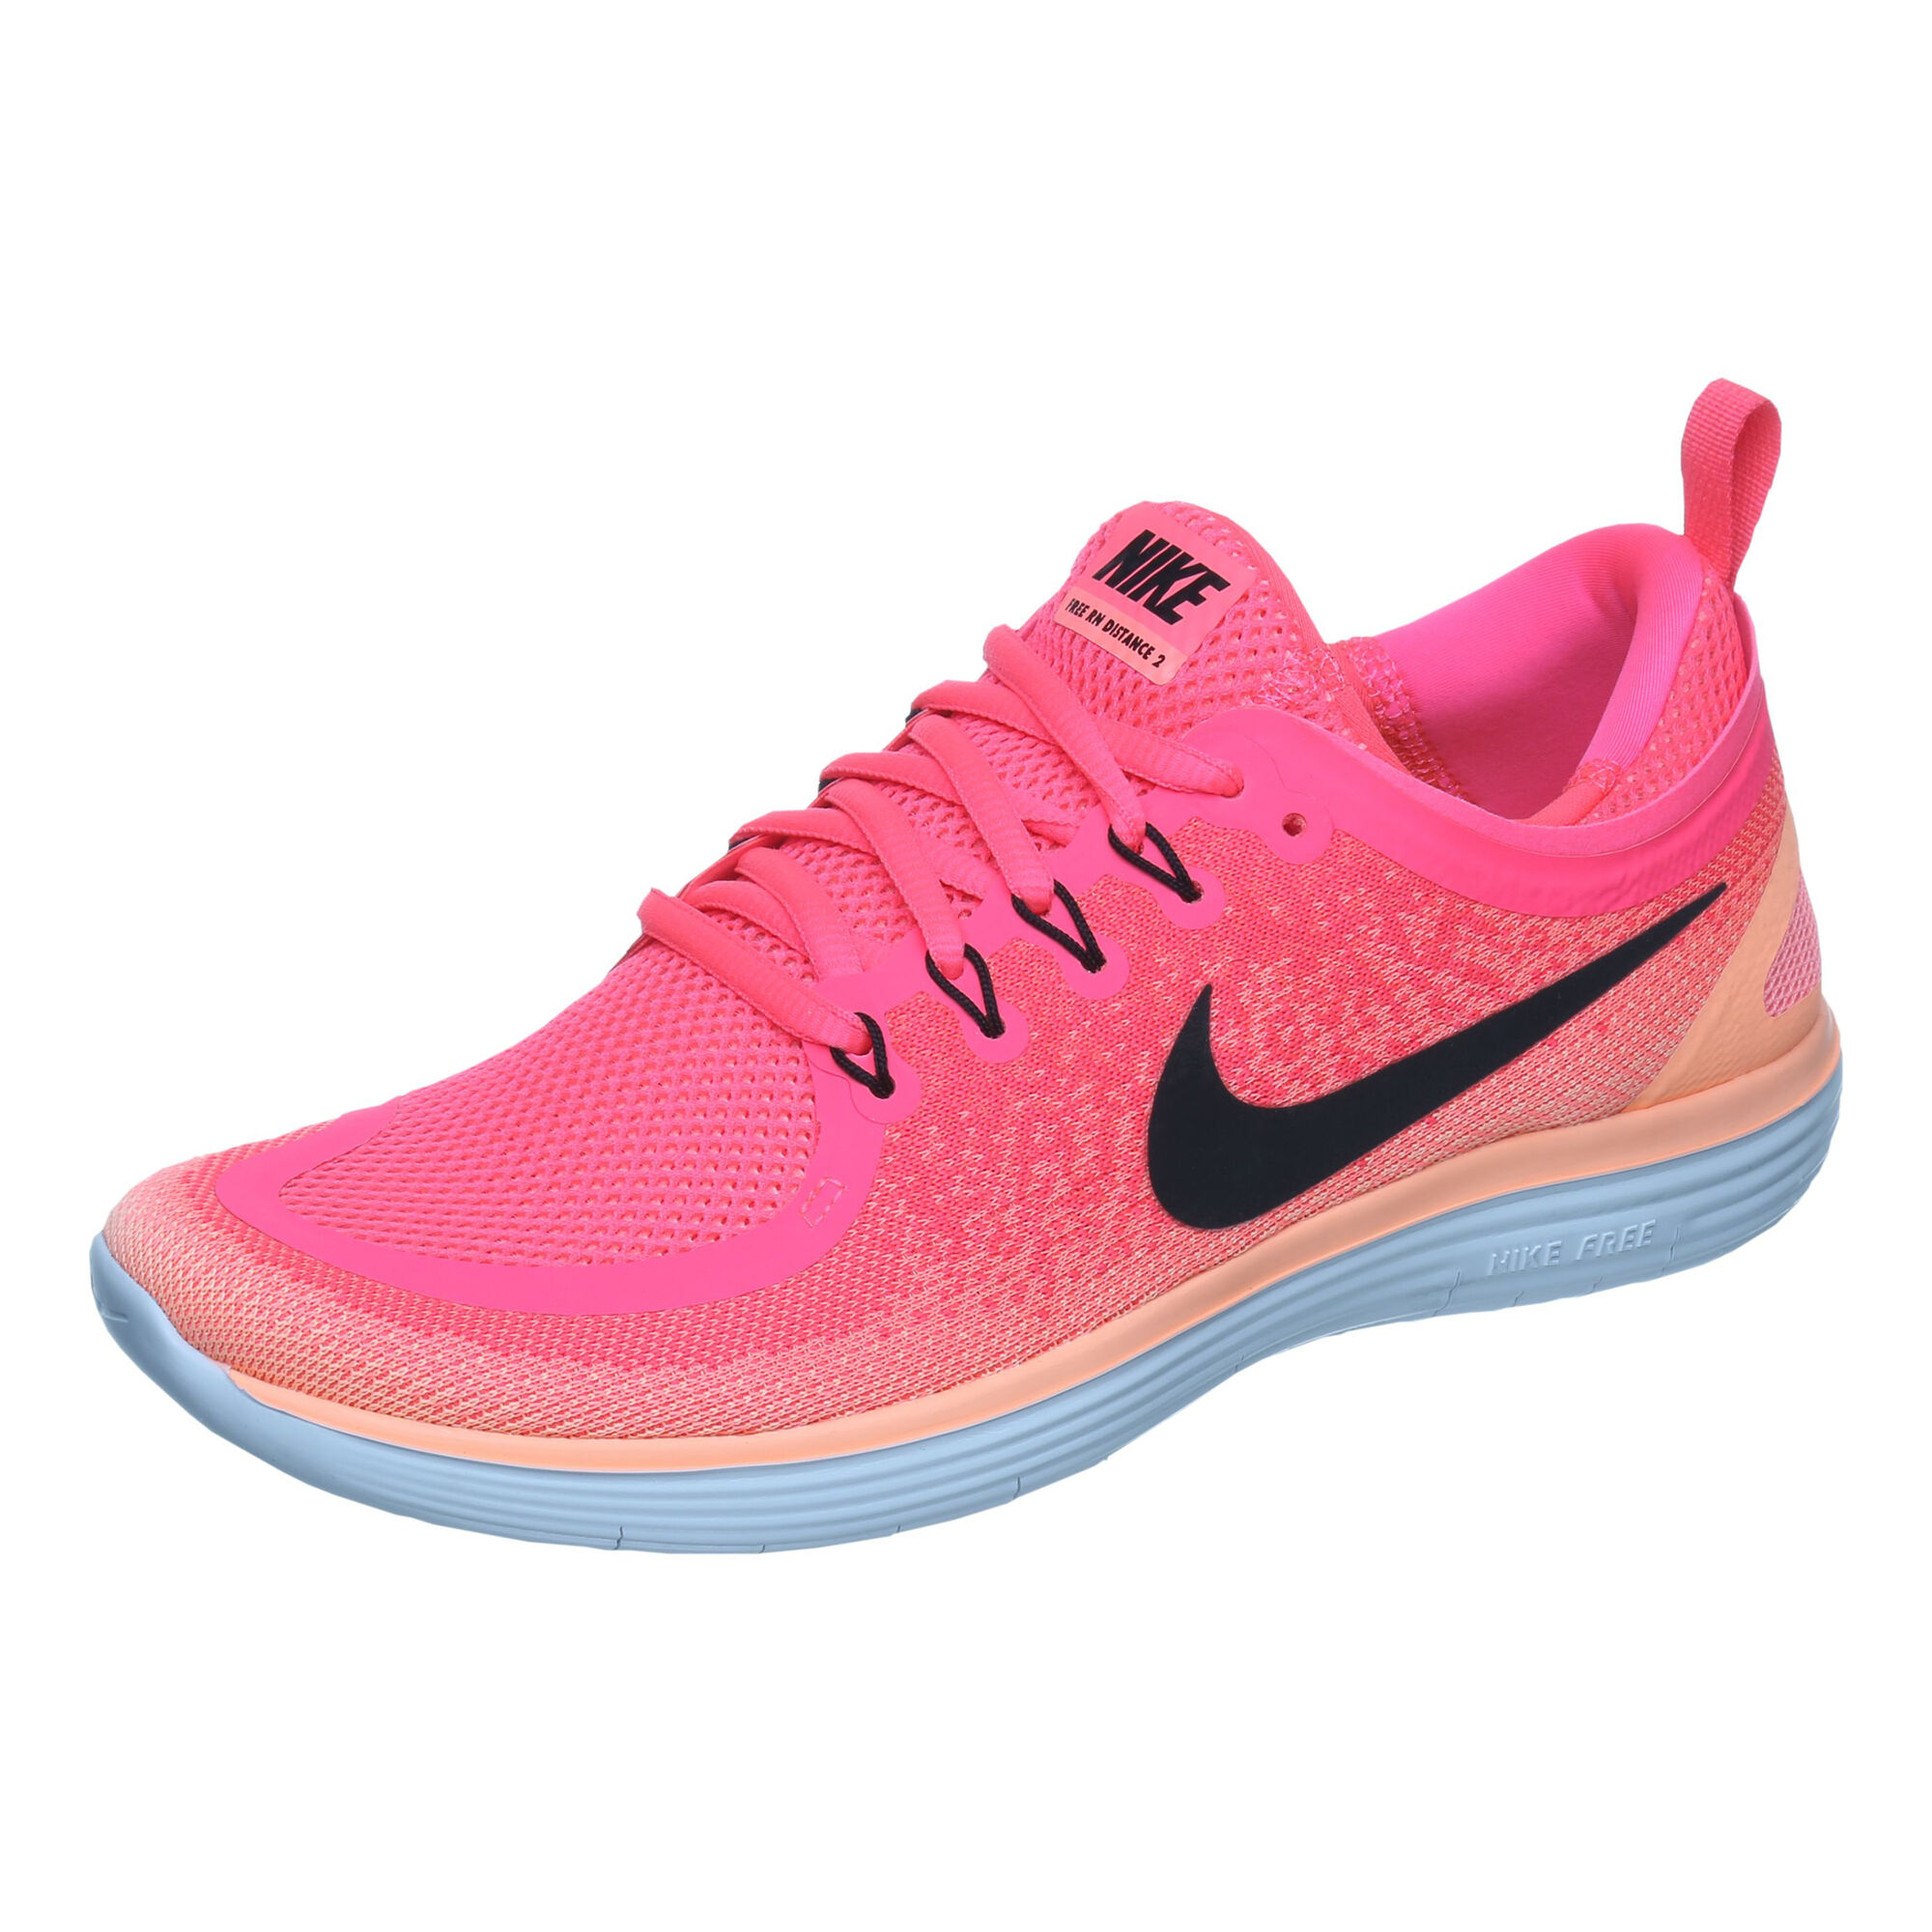 7bd93c95c5a Nike  Nike  Nike  Nike  Nike  Nike  Nike  Nike  Nike  Nike. Nike Free RN  Distance 2 Women ...